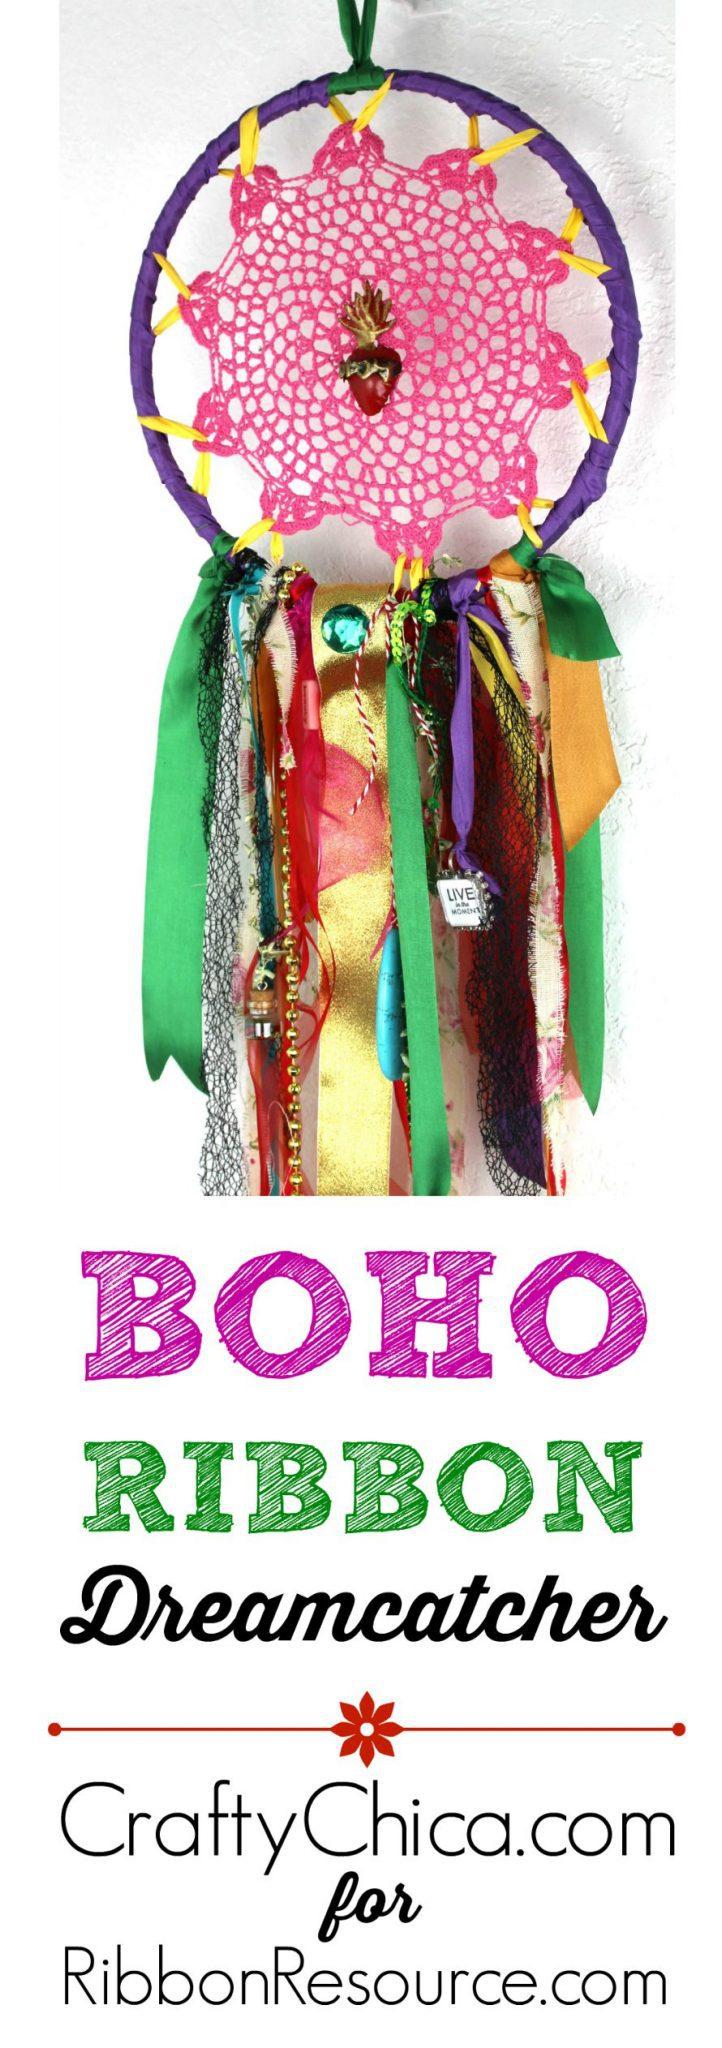 Boho Ribbon Dreamcatcher by CraftyChica.com